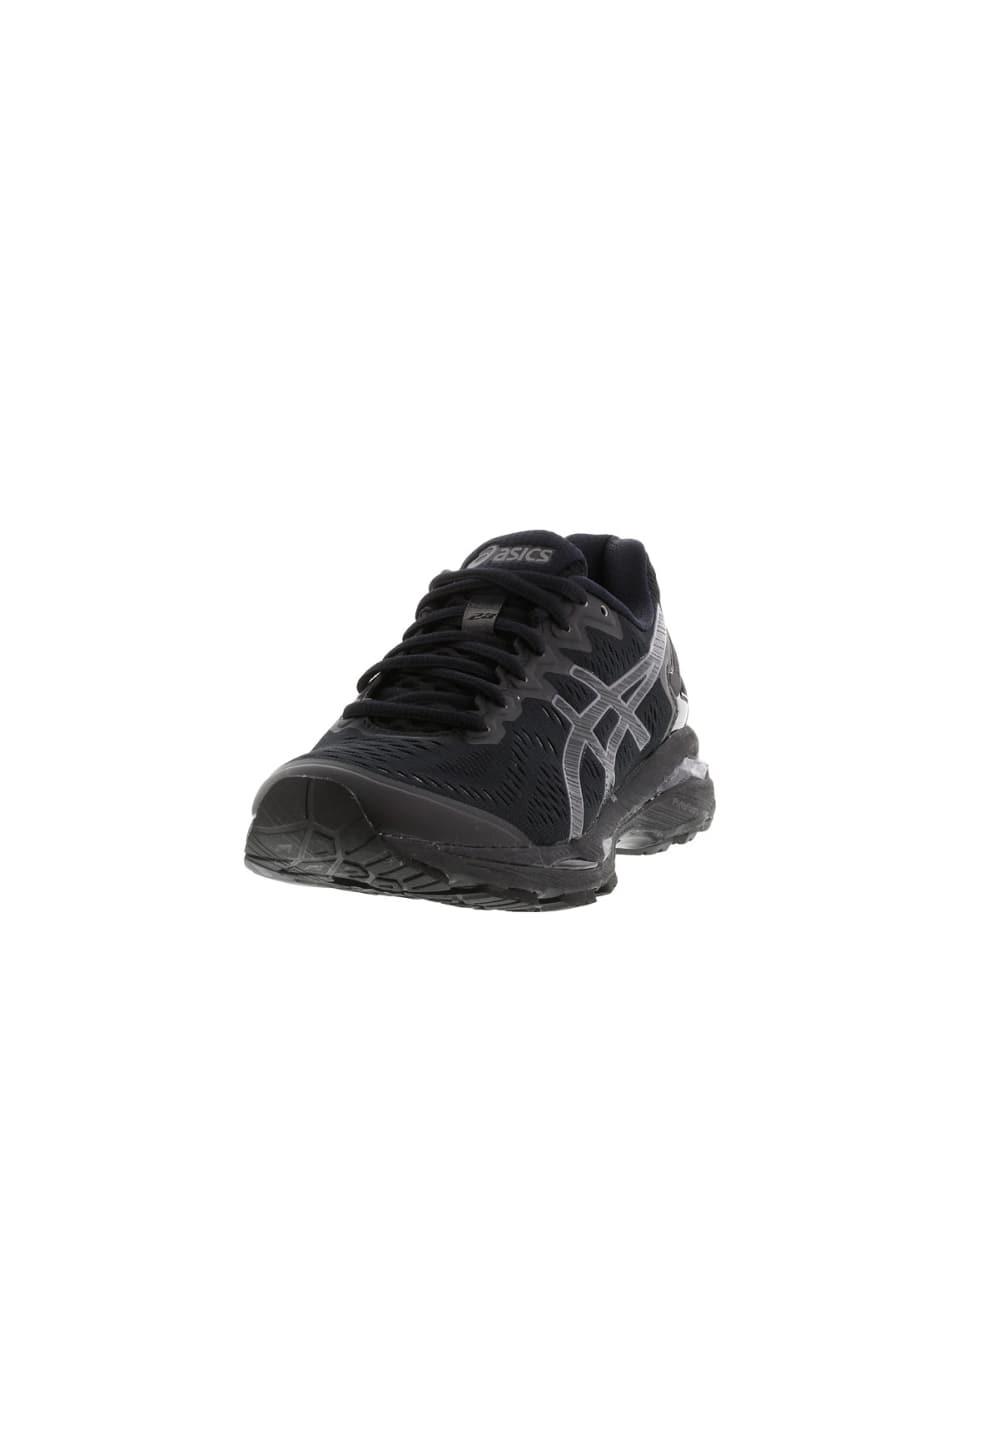 Conception innovante c9c1c 80fec ASICS GEL-Kayano 23 - Running shoes for Women - Black